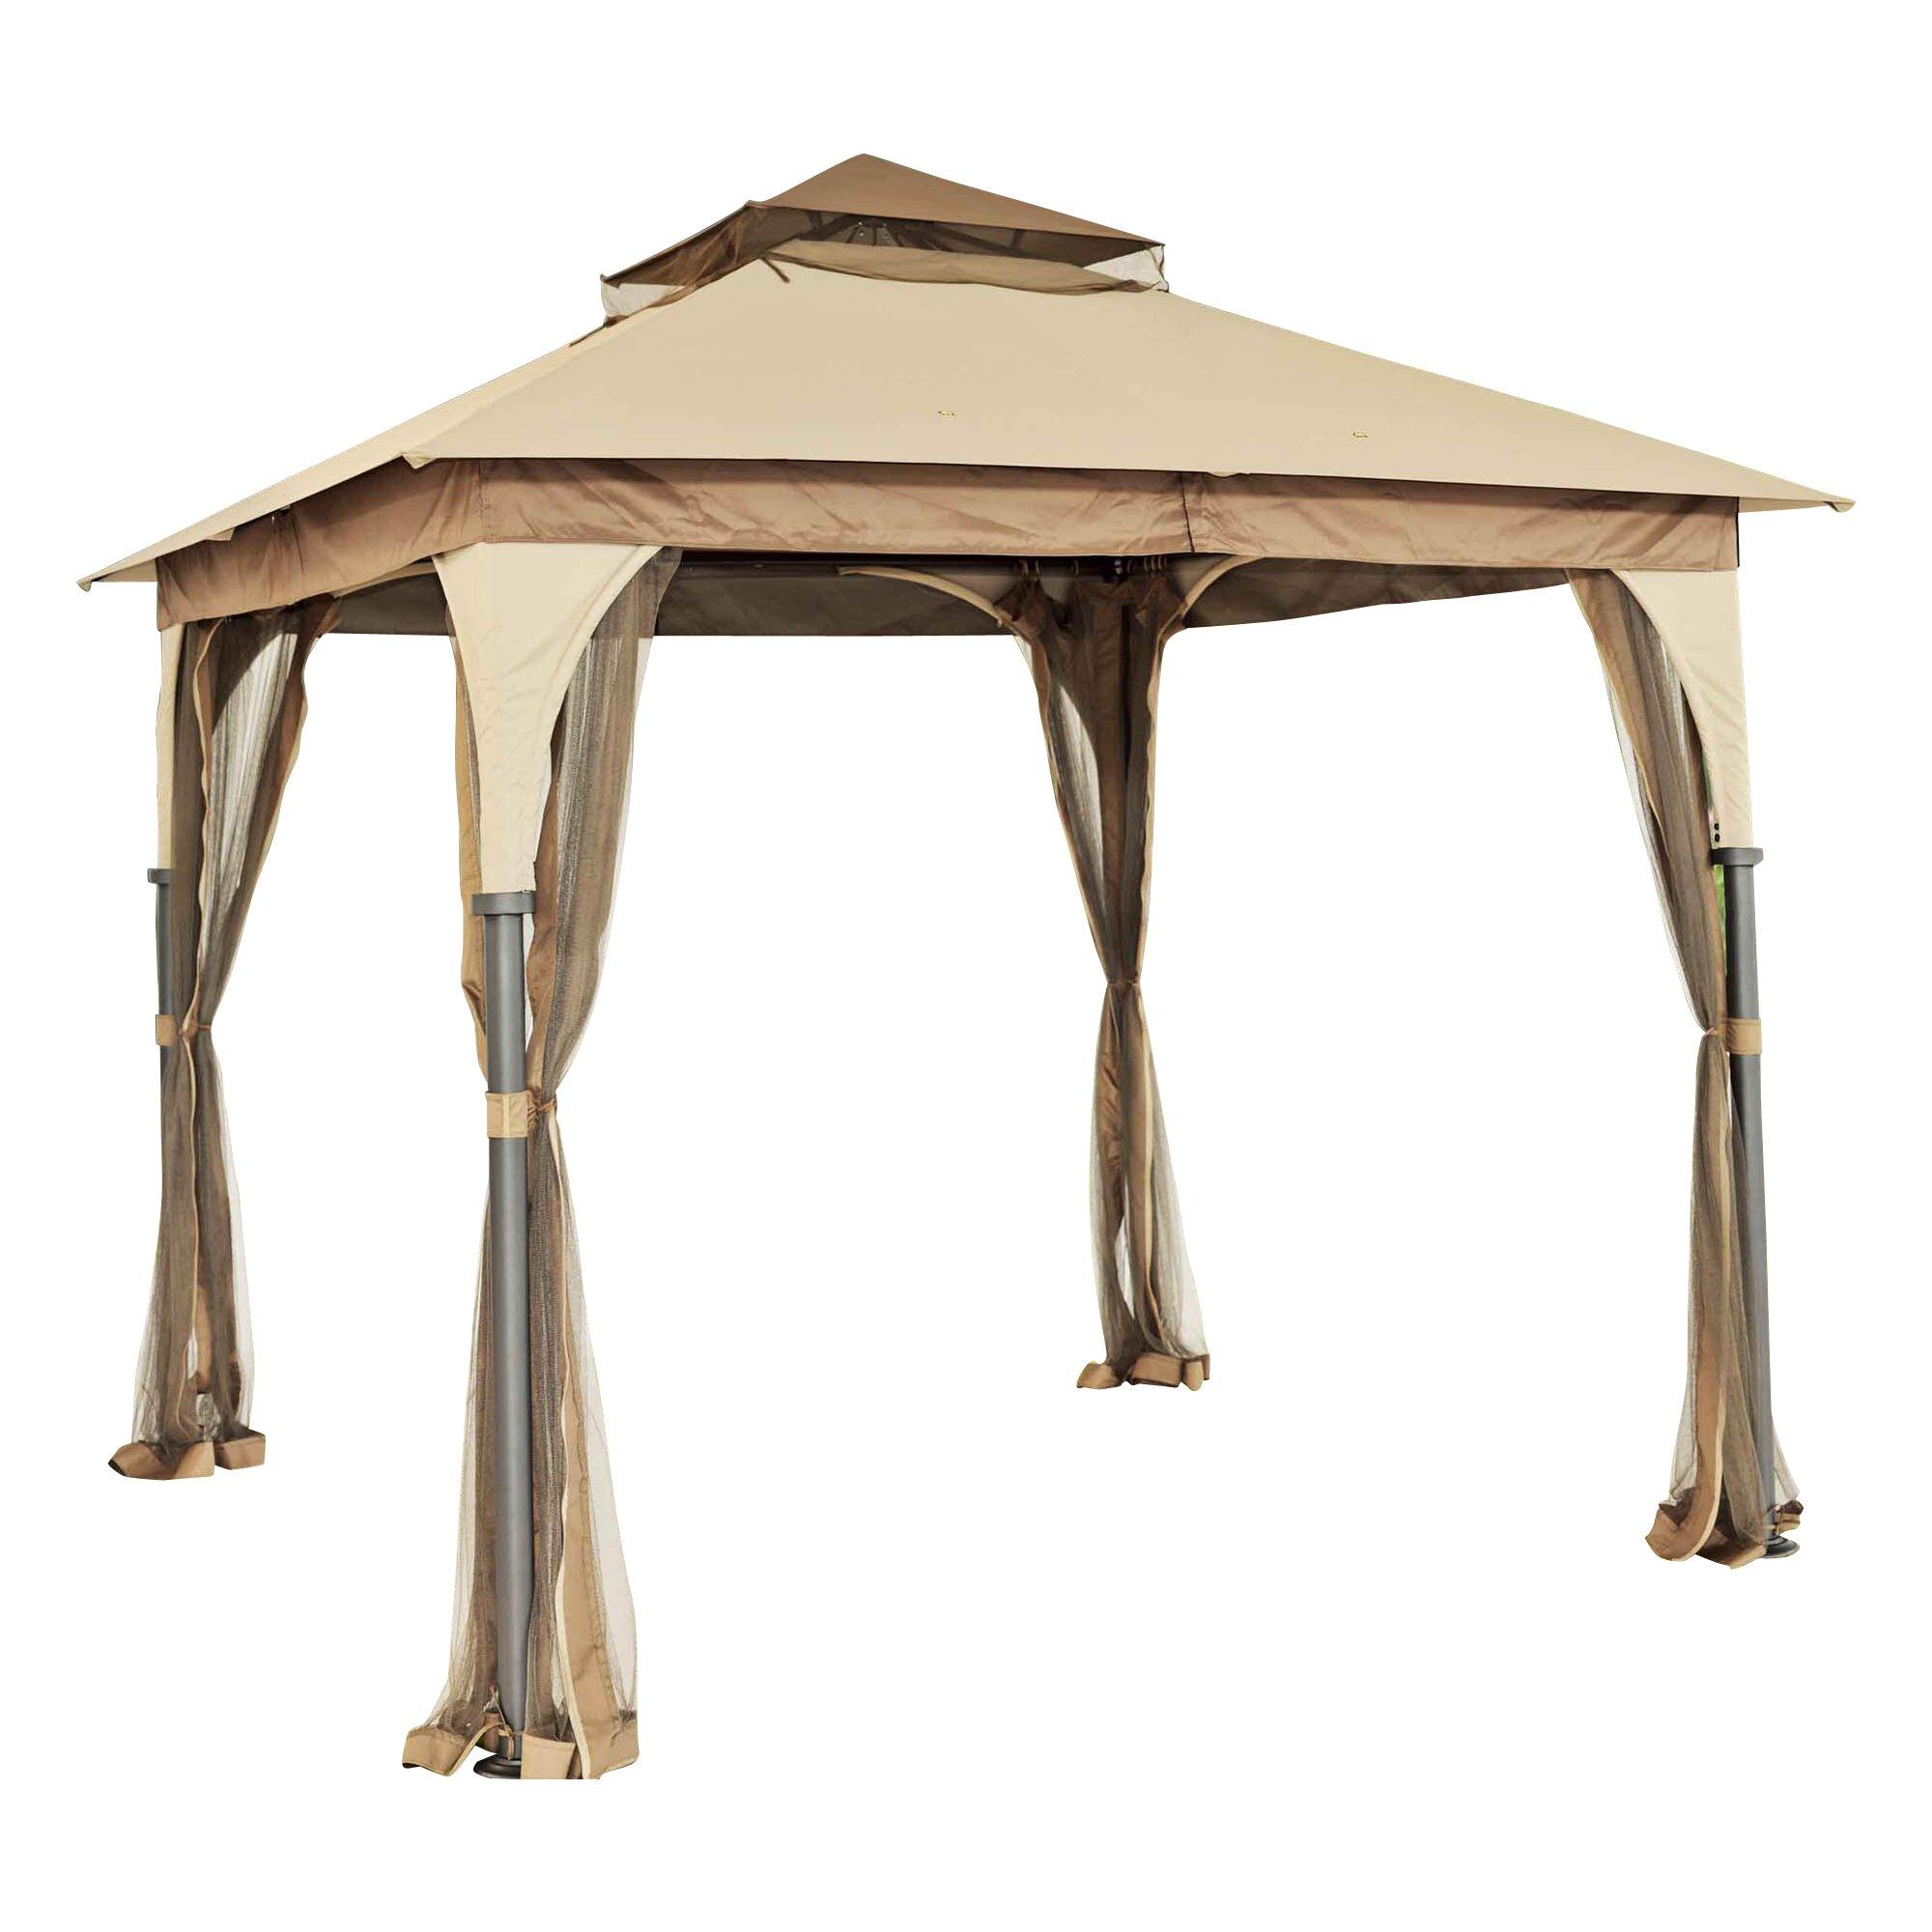 Outdoor outdoor shades amp structures metal gazebos sunjoy sku